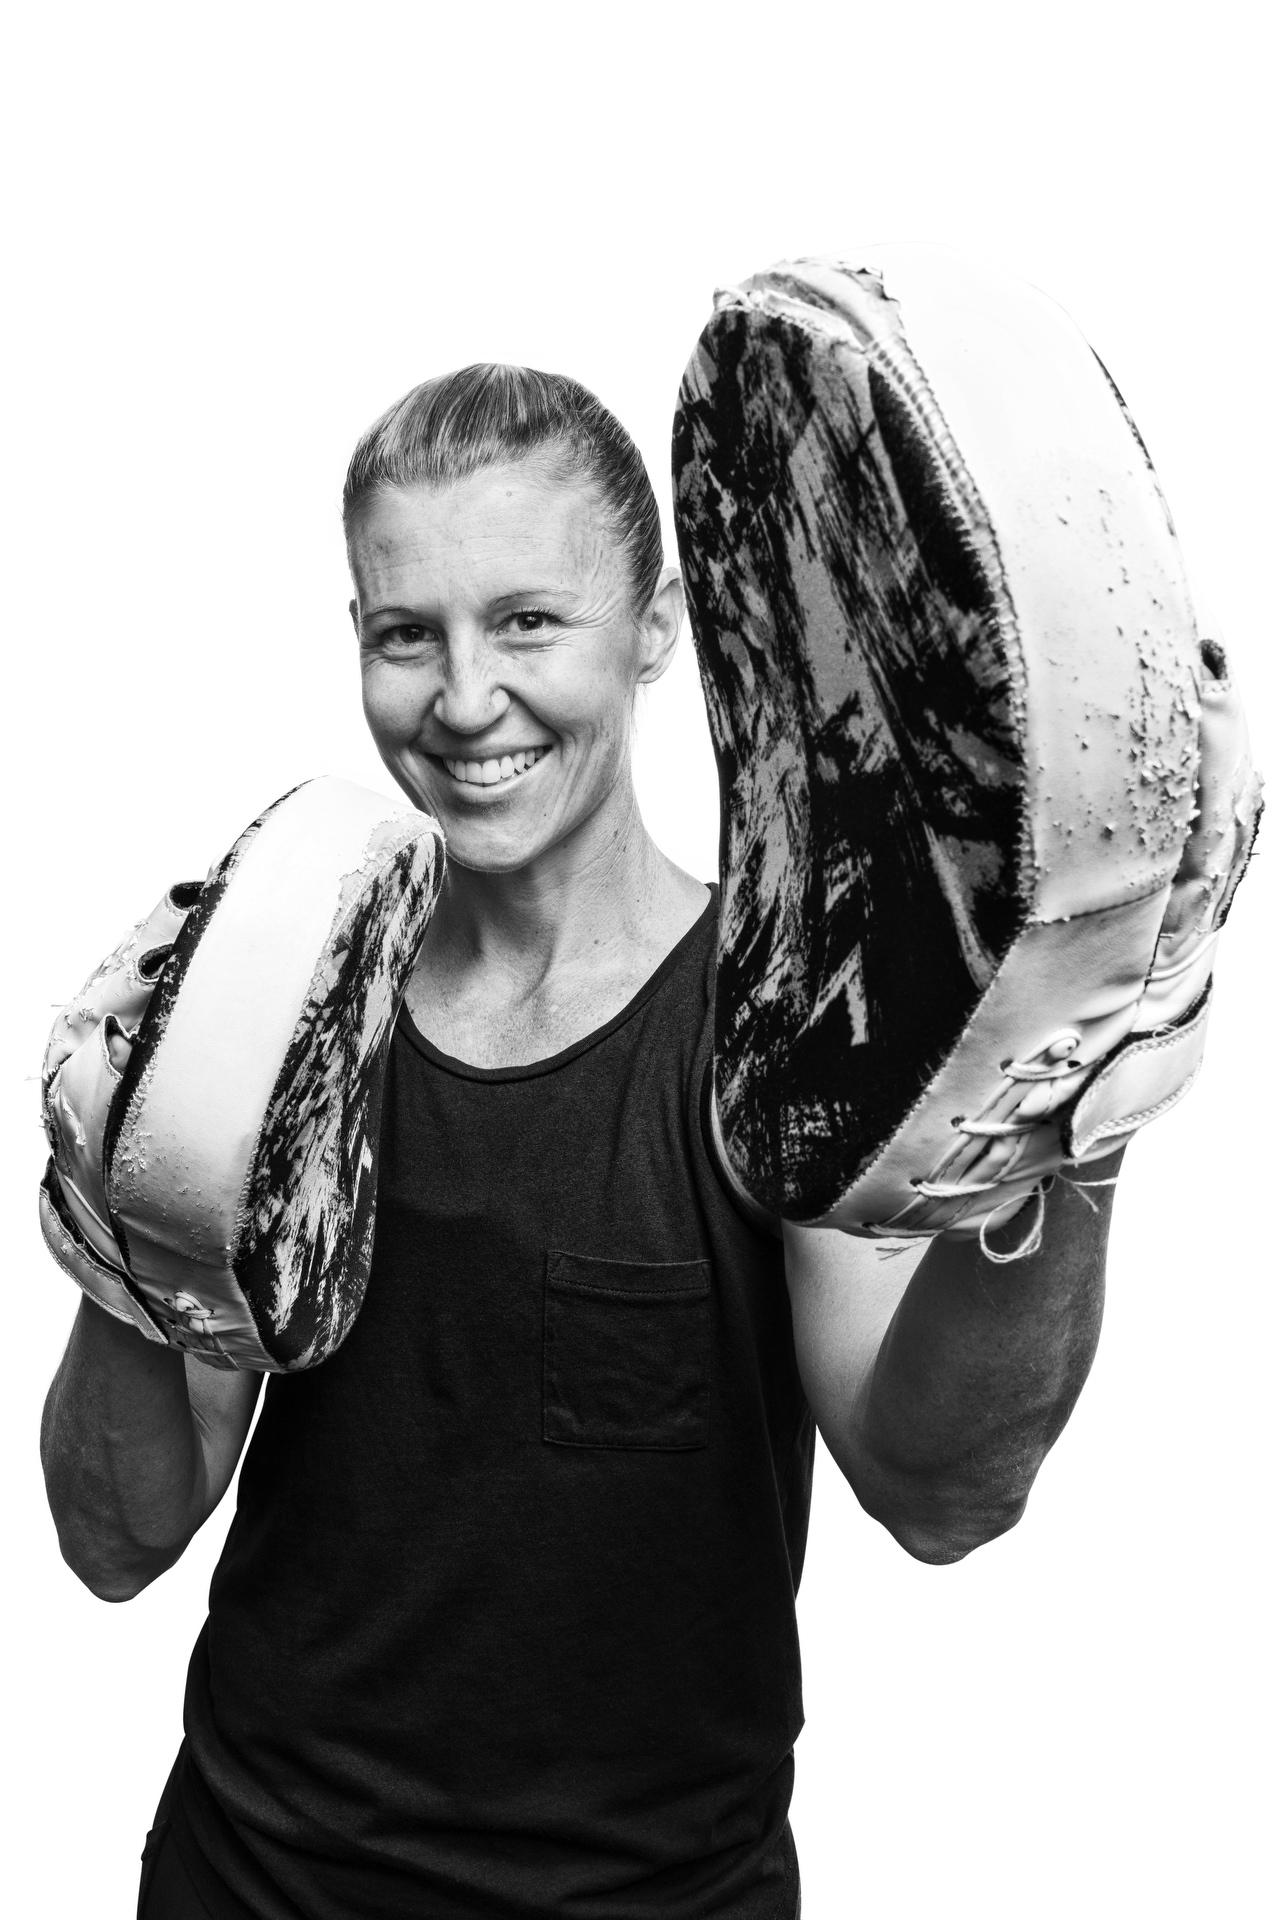 Sydney portrait photographer, personal branding, head shots, corporate photography, personal trainer, fitness